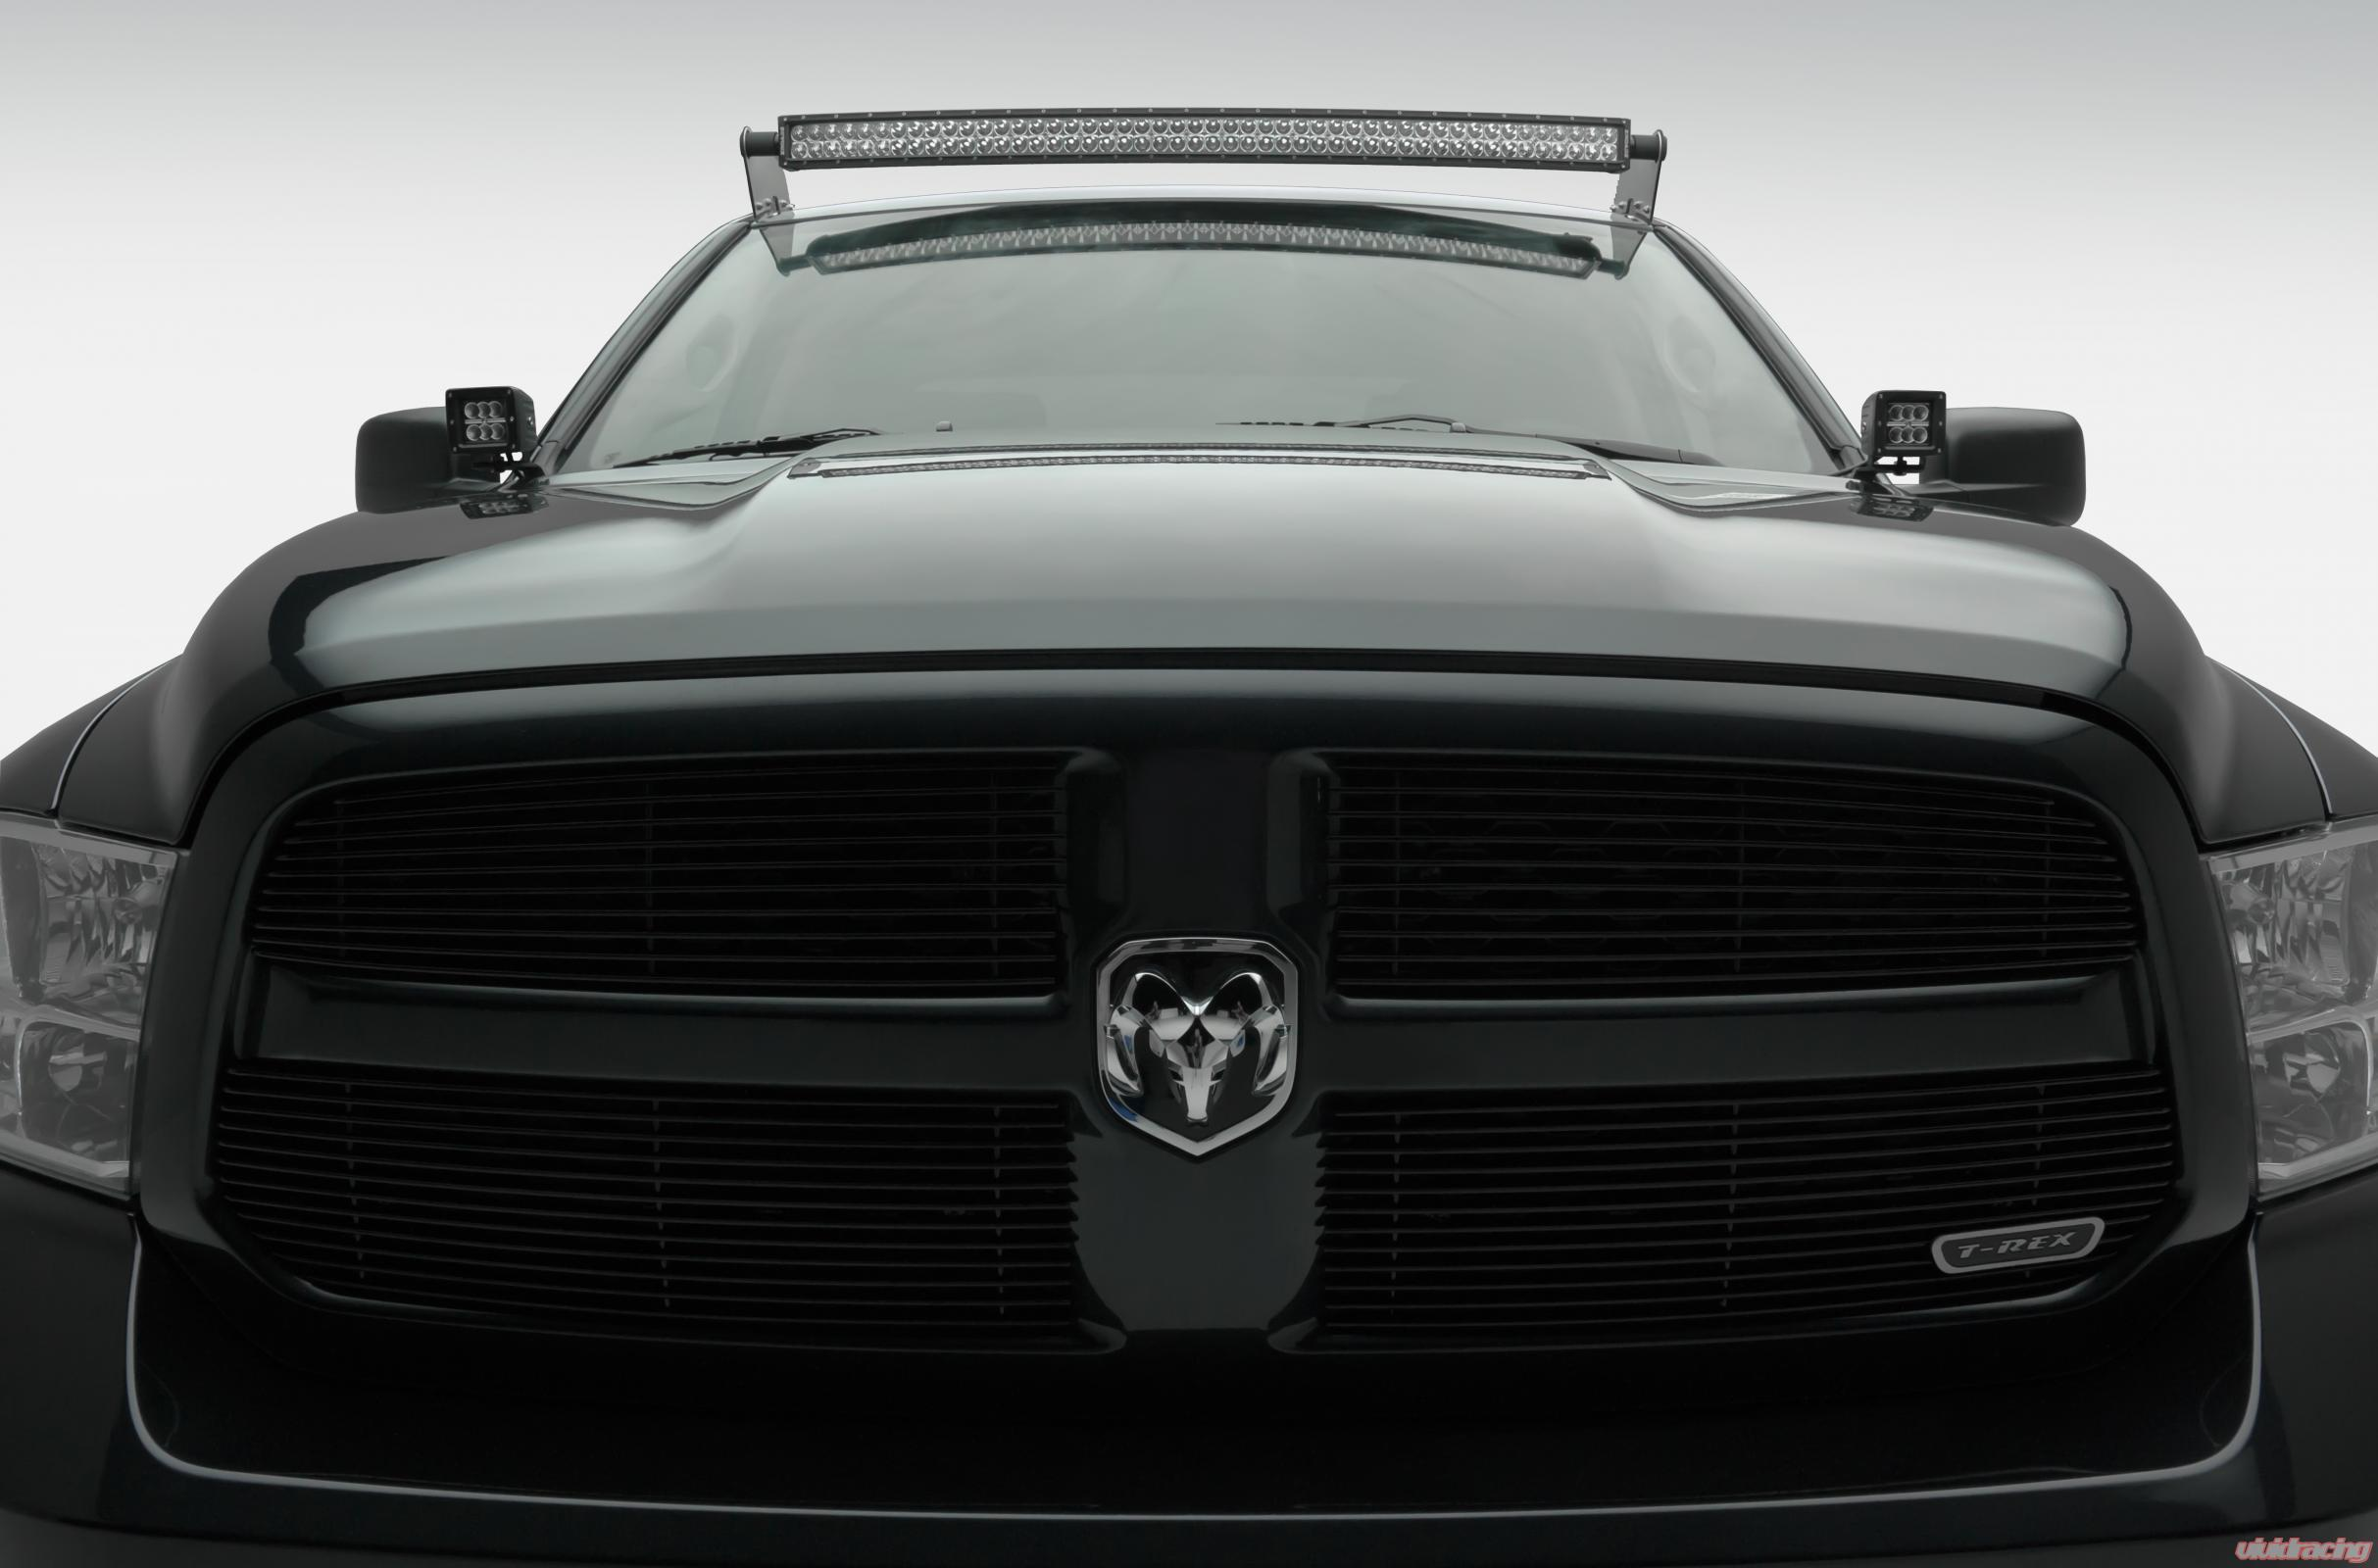 Z334521 Kit C Front Roof Led Light Bar Mount 2009 2017 Dodge 50 Inch Wiring Harness Ram 1500 W